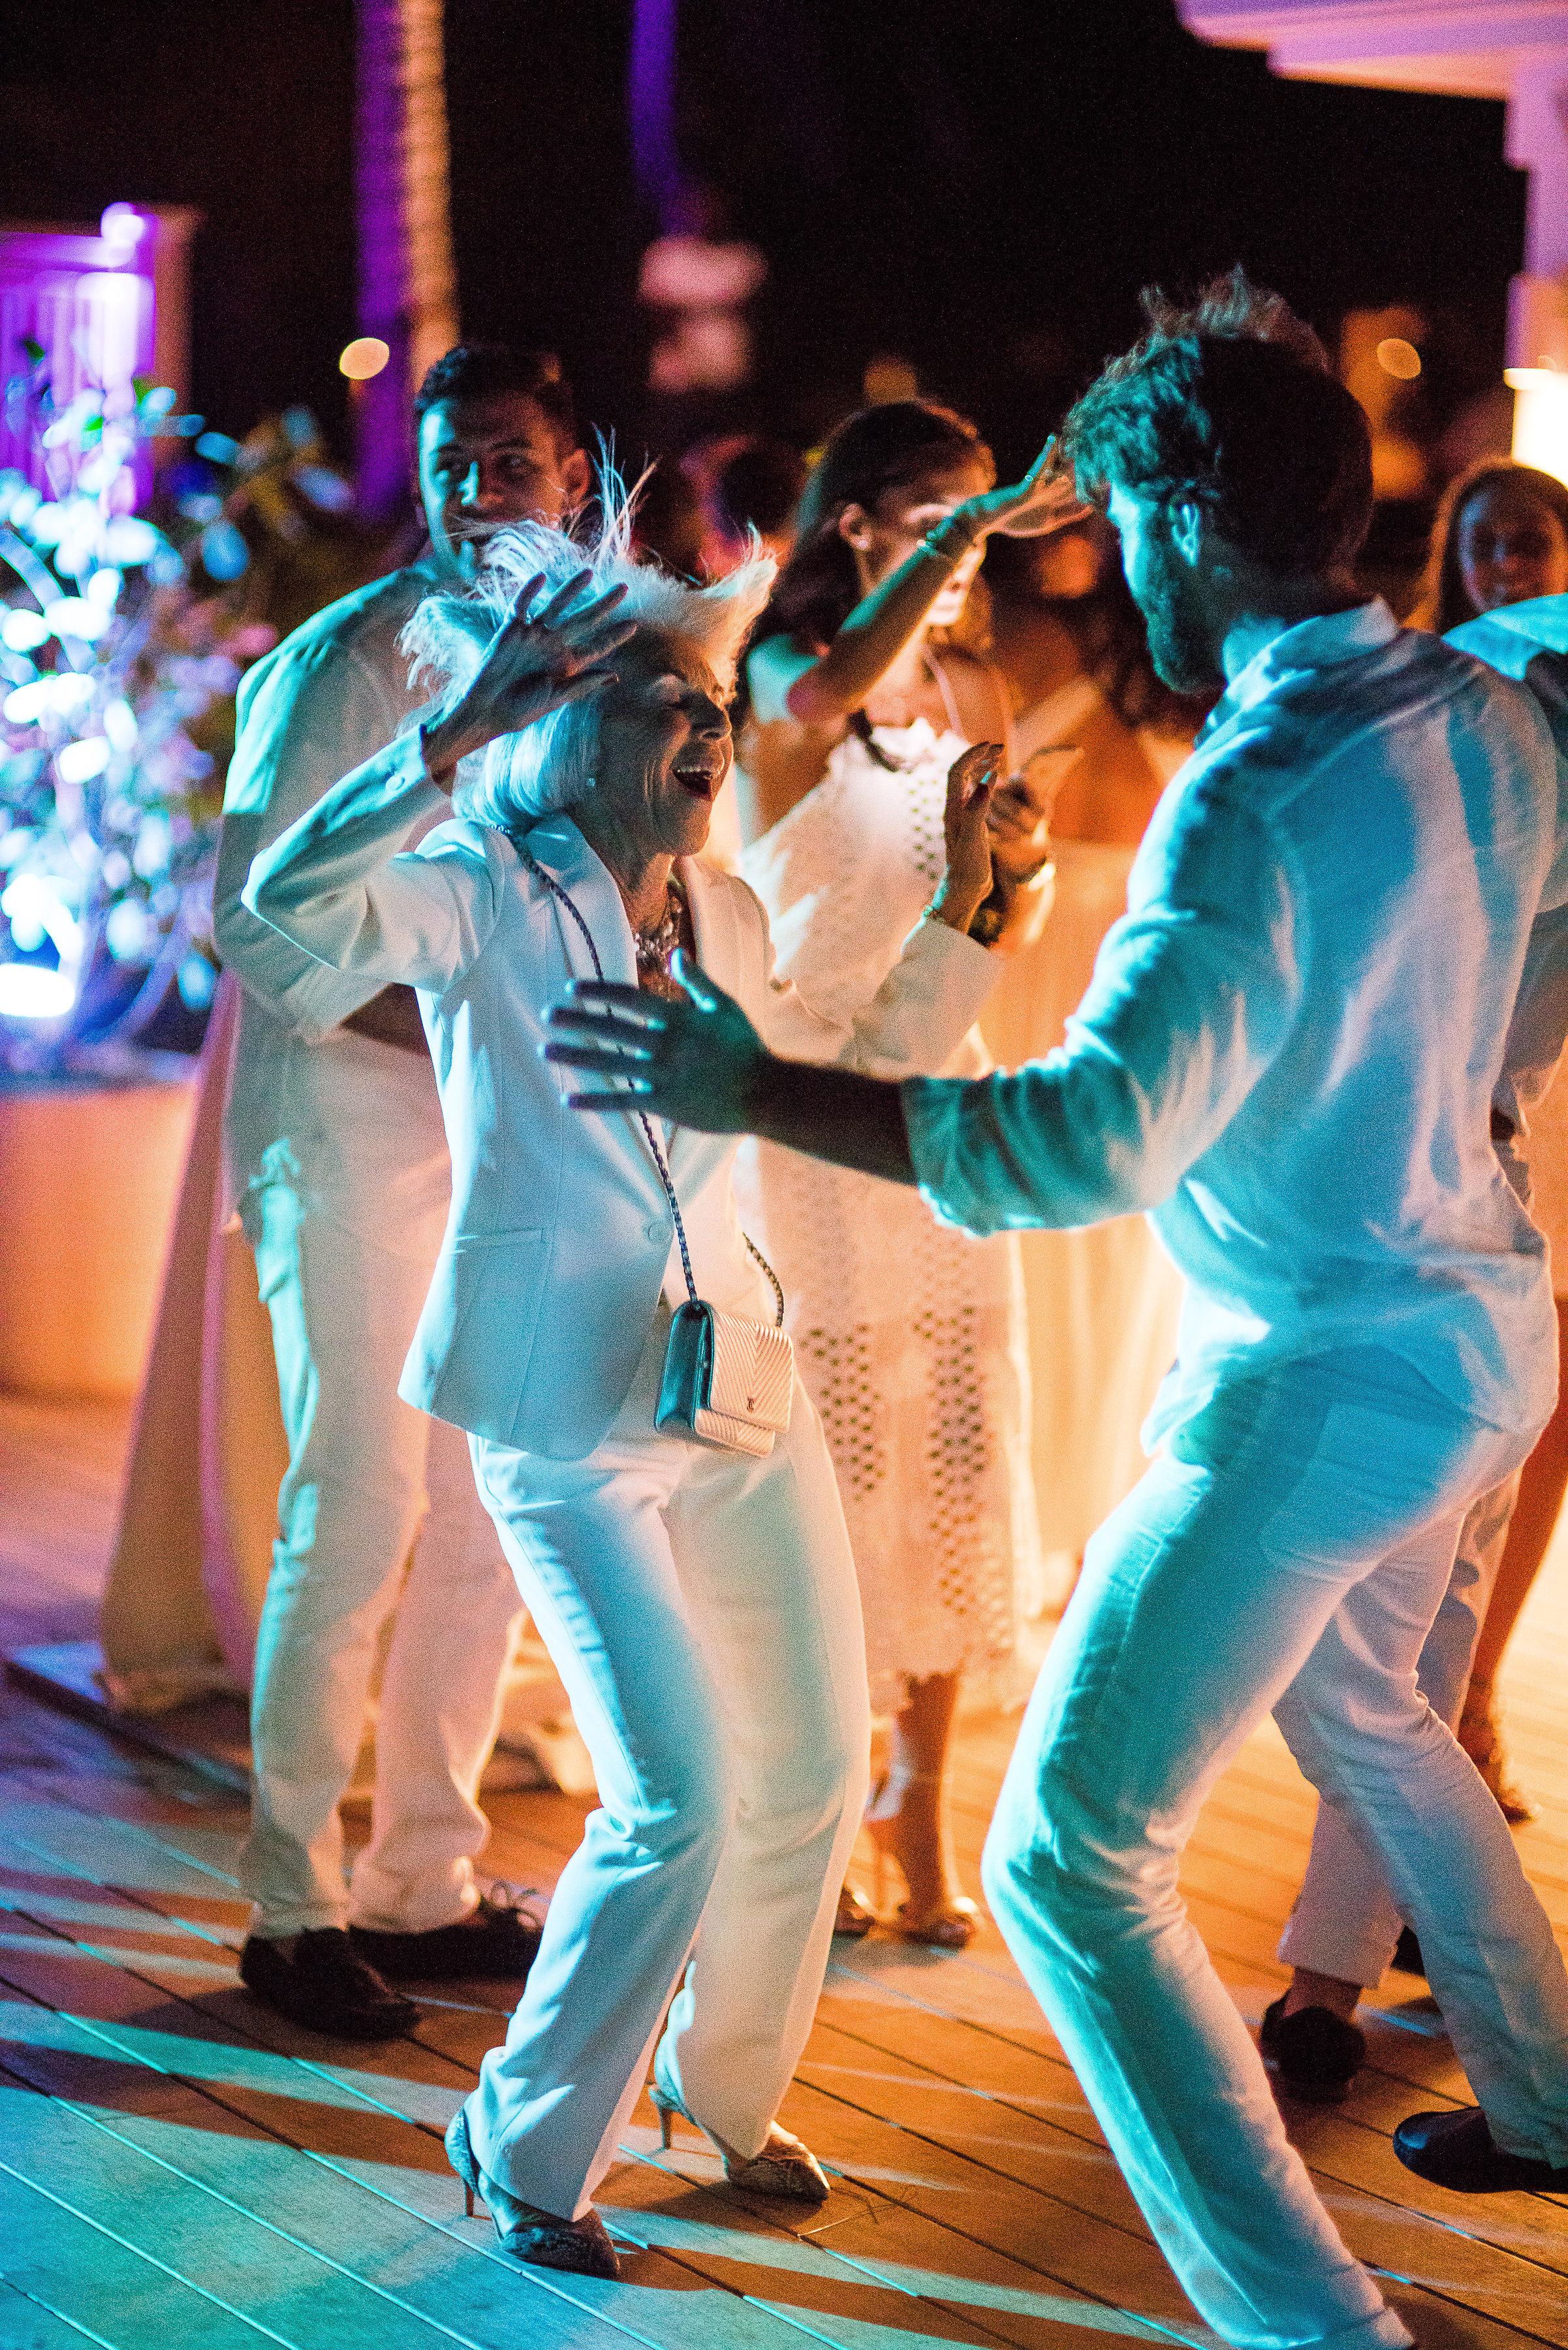 Ceci_New_York_Ceci_Style_Ceci_Johnson_Luxury_Lifestyle_Destination_Bahamas_Wedding_Letterpress_Inspiration_Design_Custom_Couture_Personalized_Invitations_52.jpg